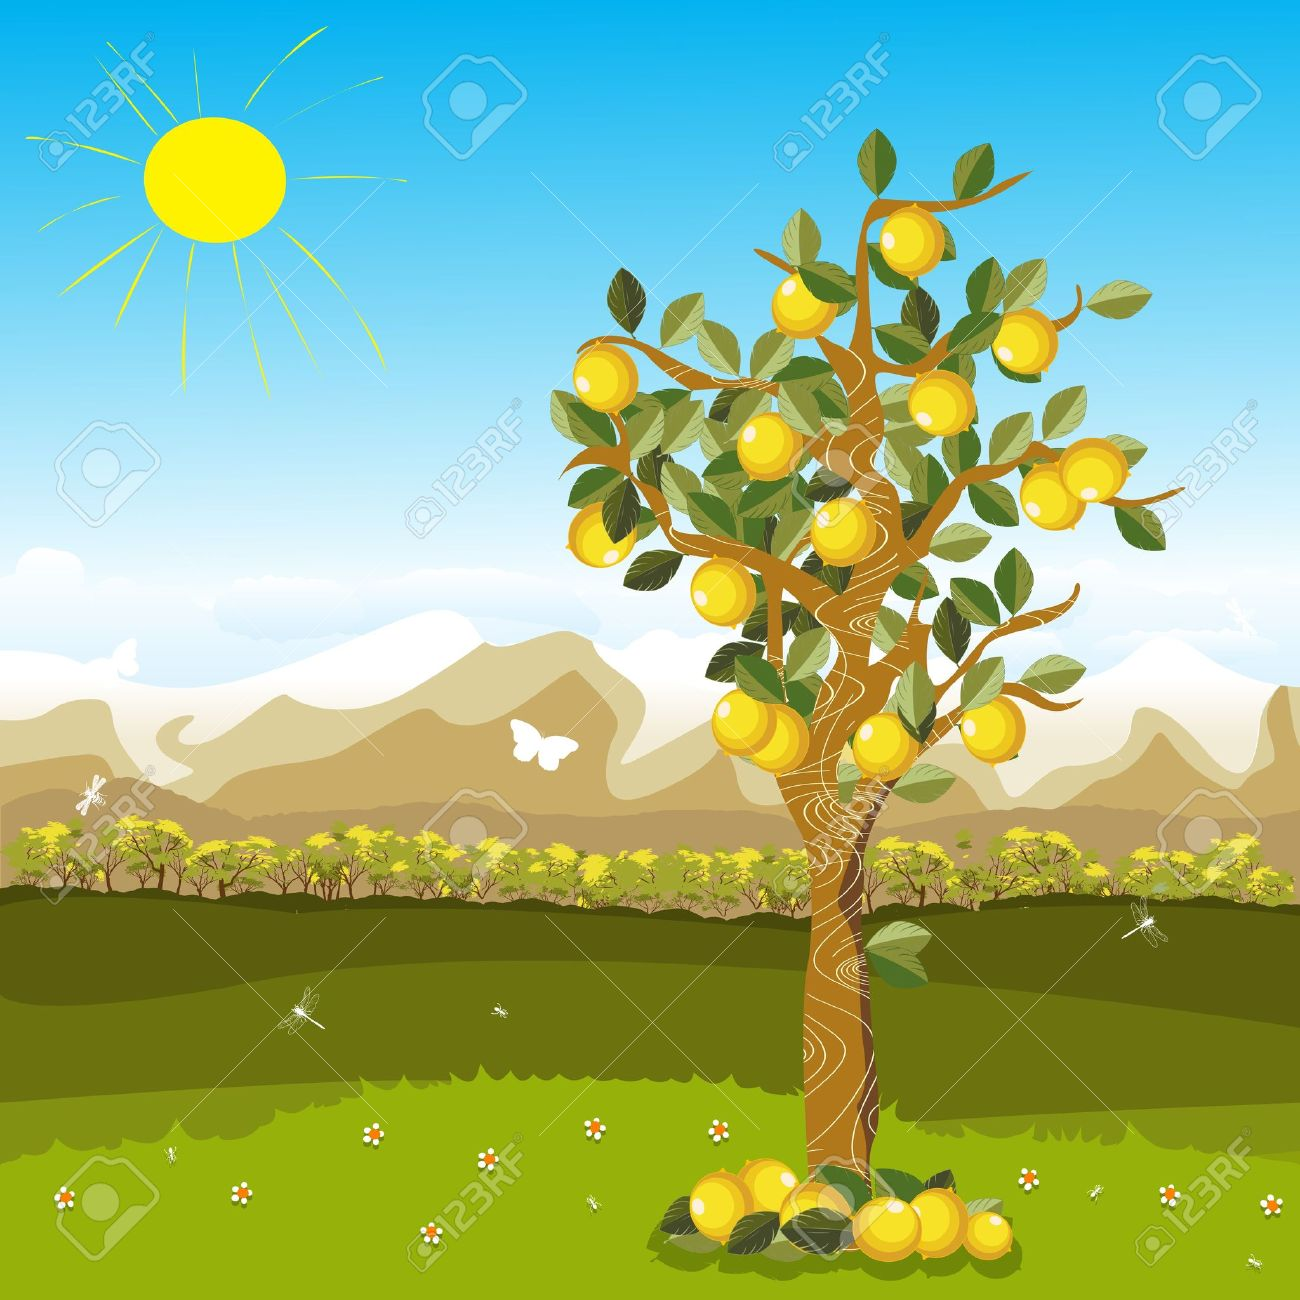 Cartoon illustration of a lemon tree over a beautiful autumn background Stock Vector - 9861125